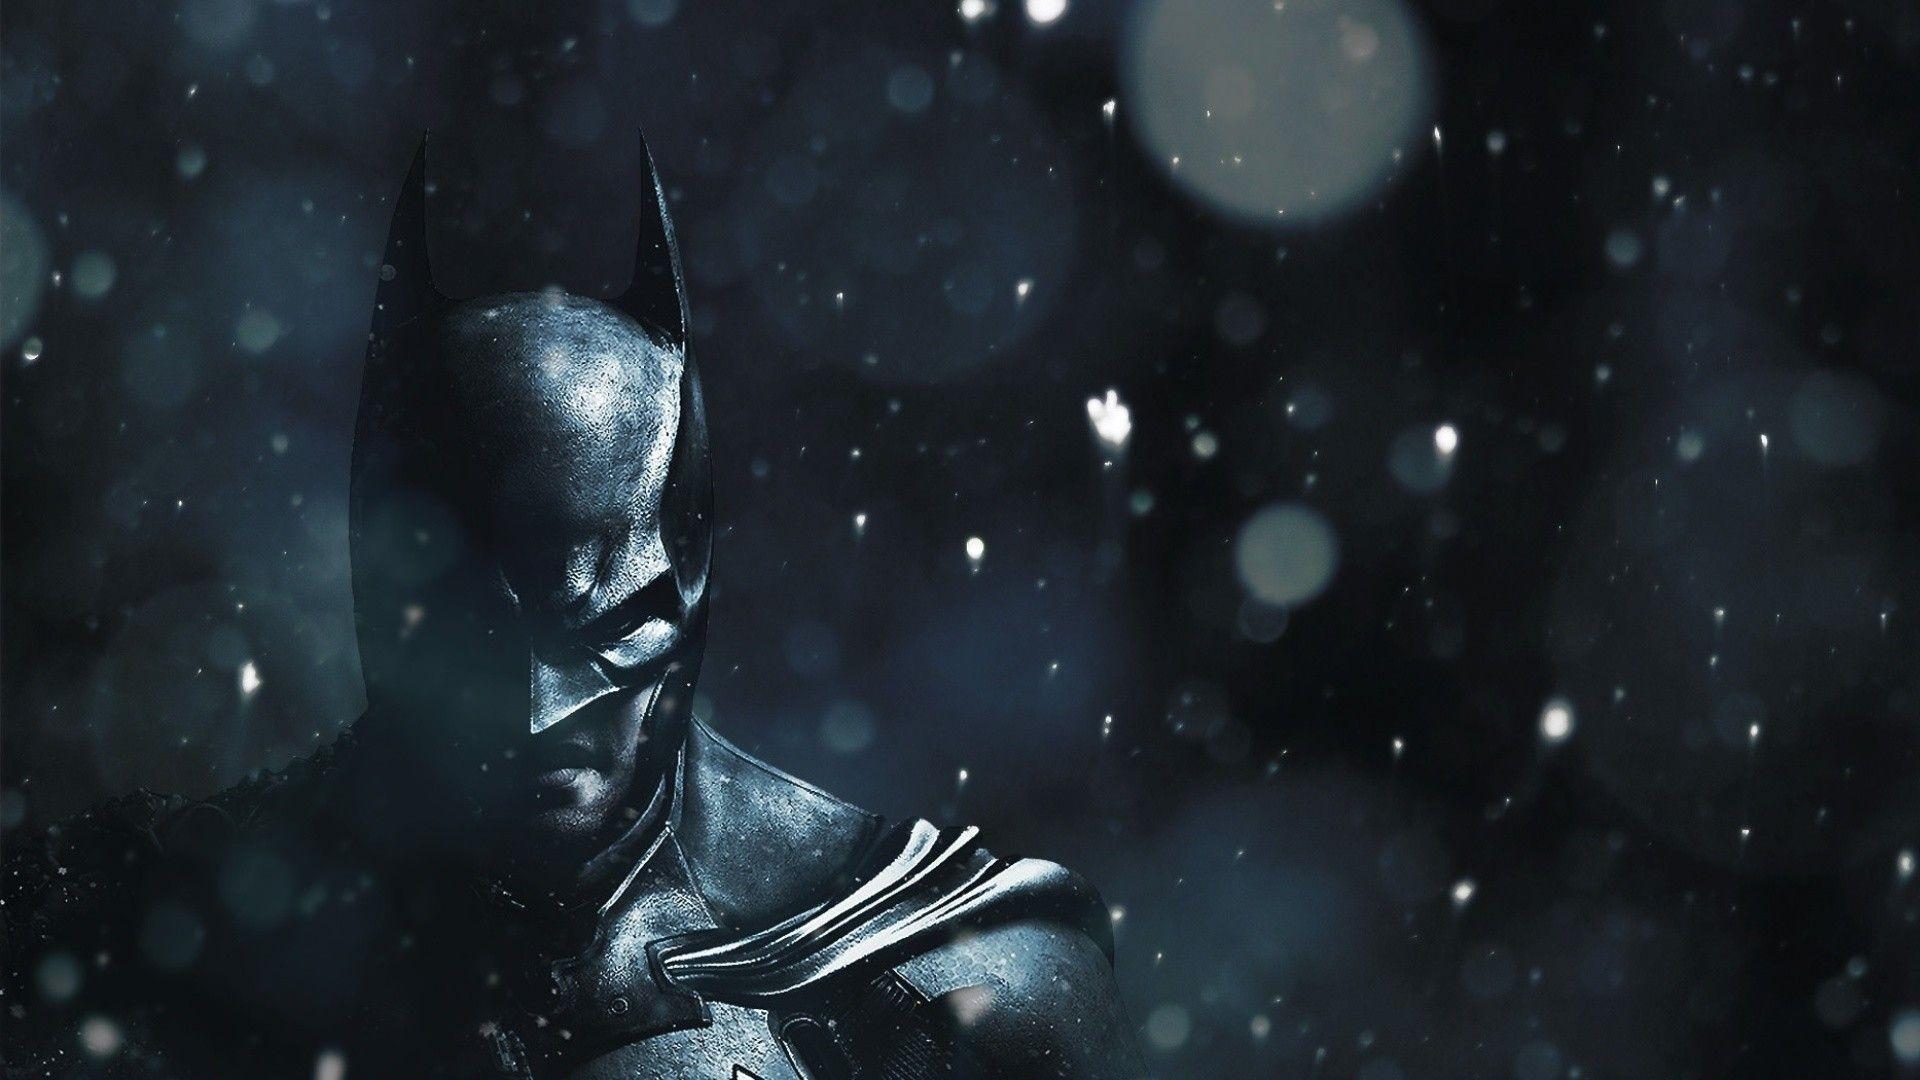 HD-Wallpaper-of-batman-movie-1024×576